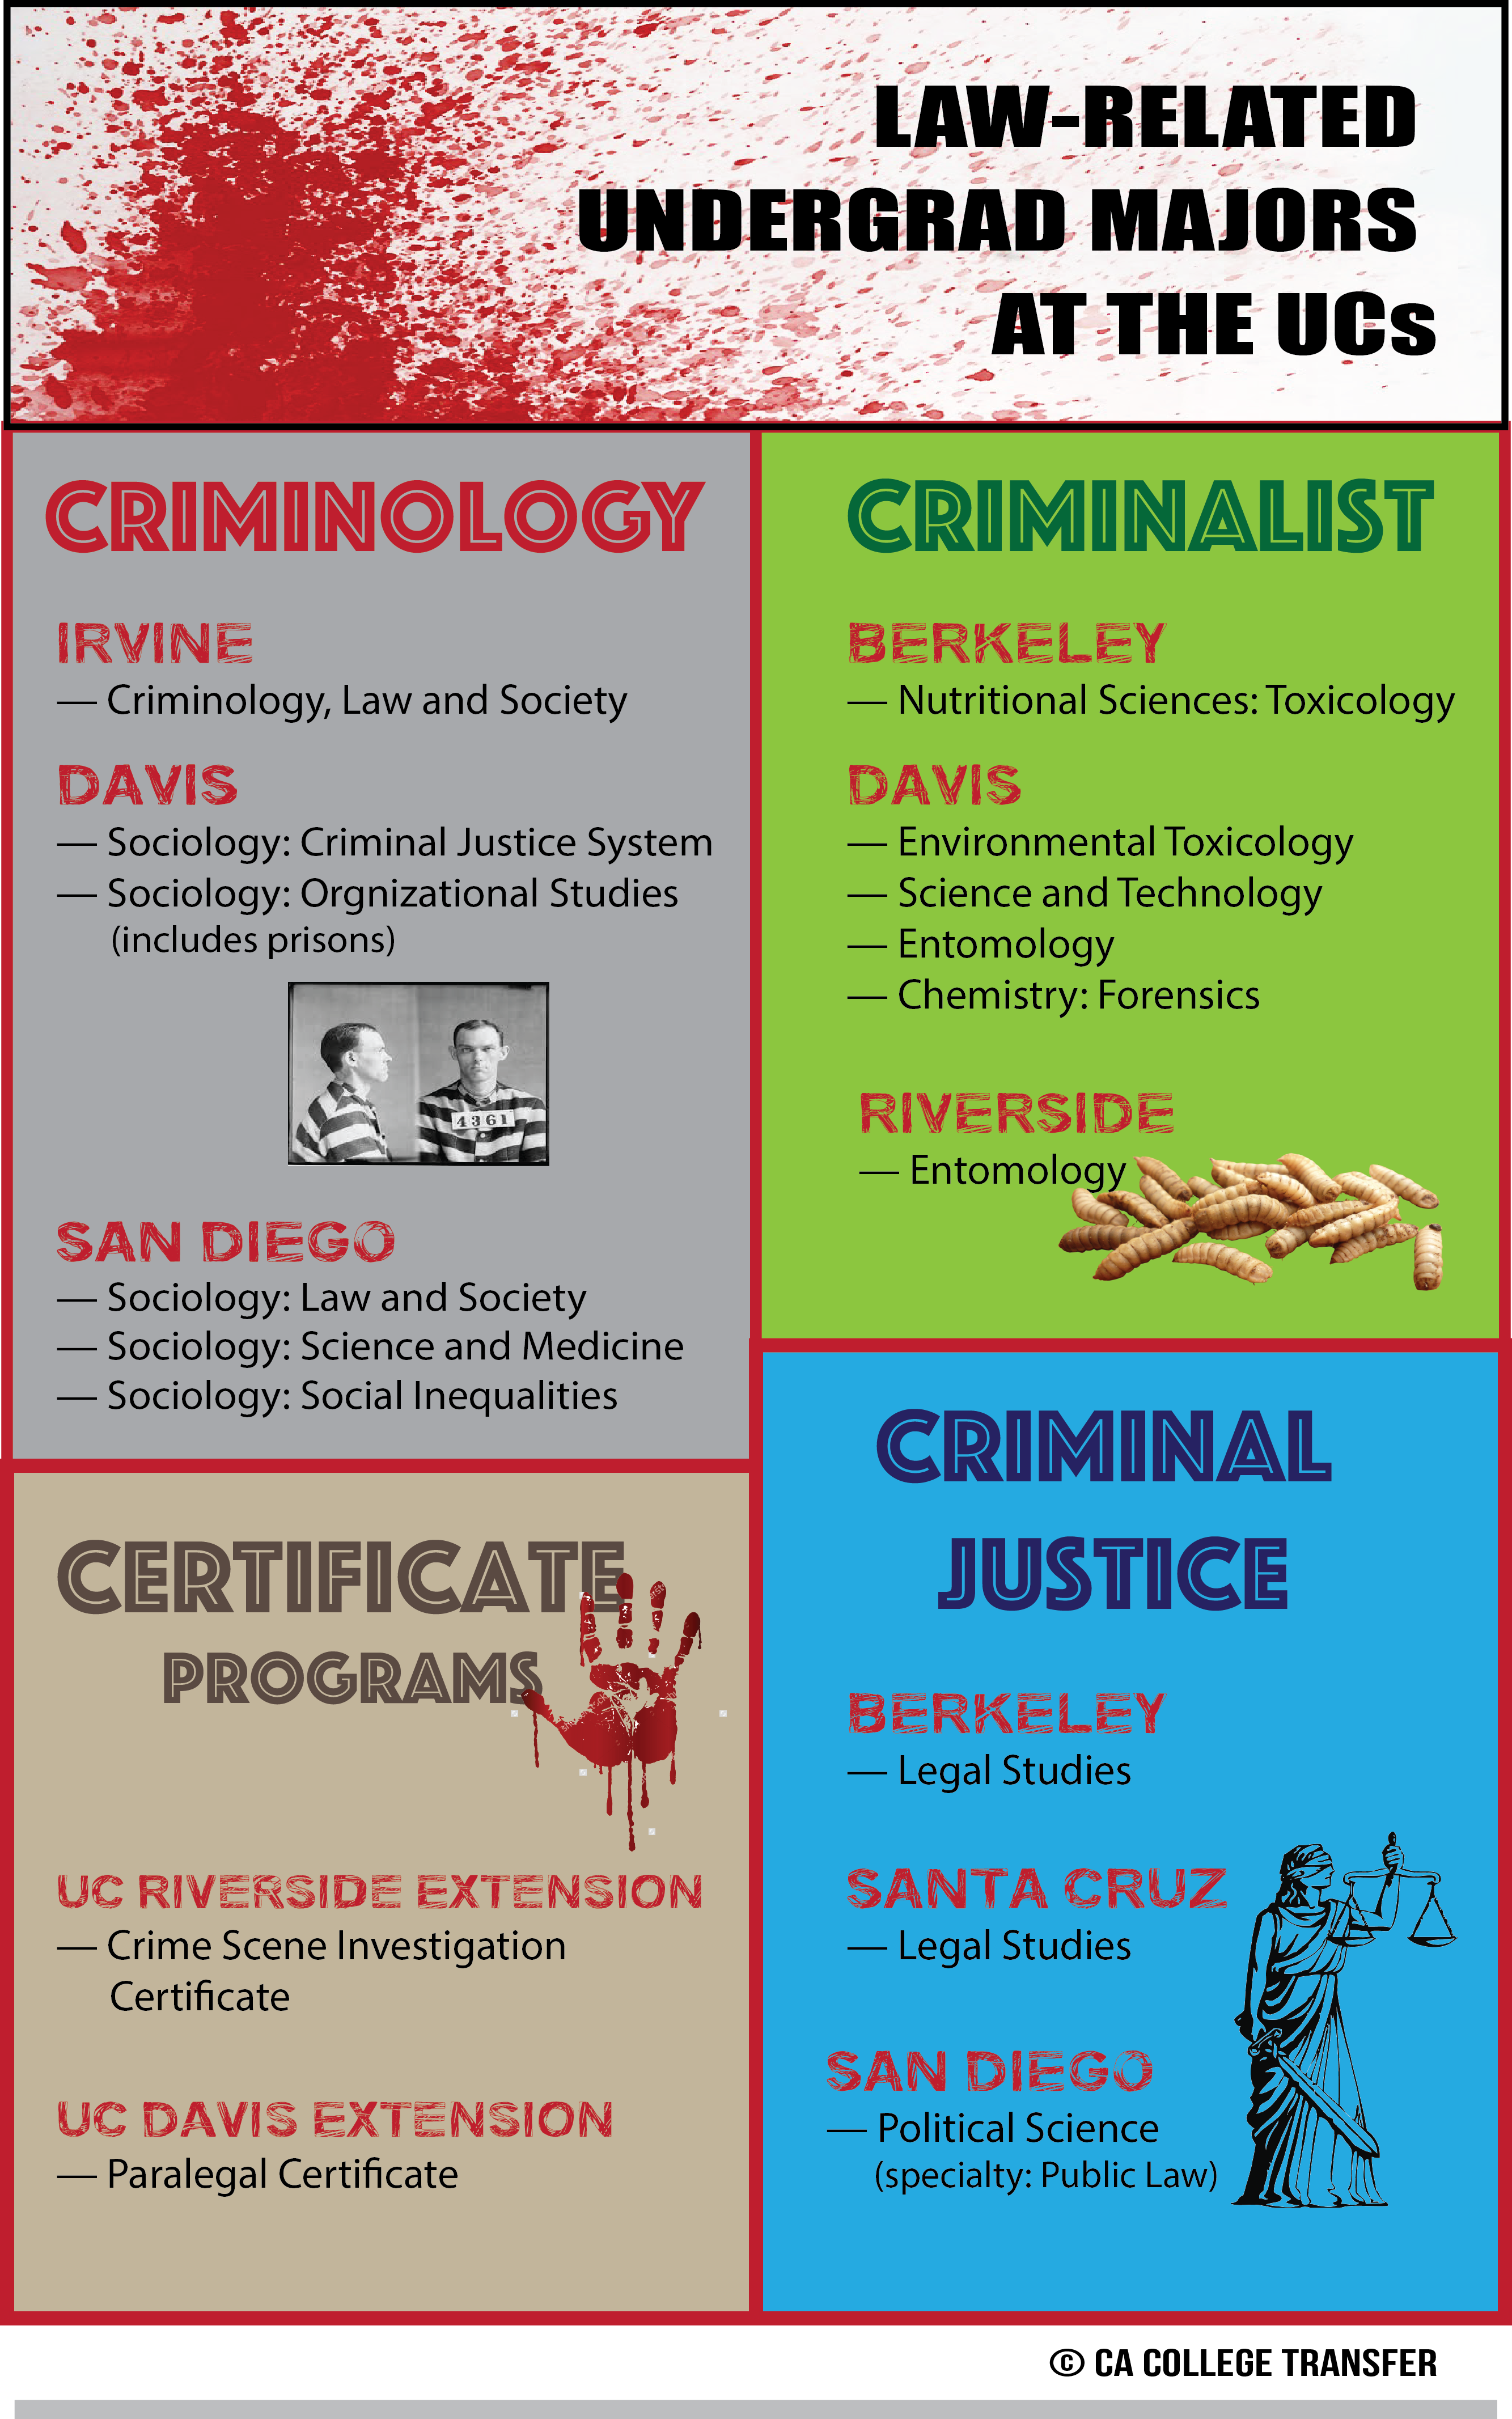 Law-Related Undergrad Majors